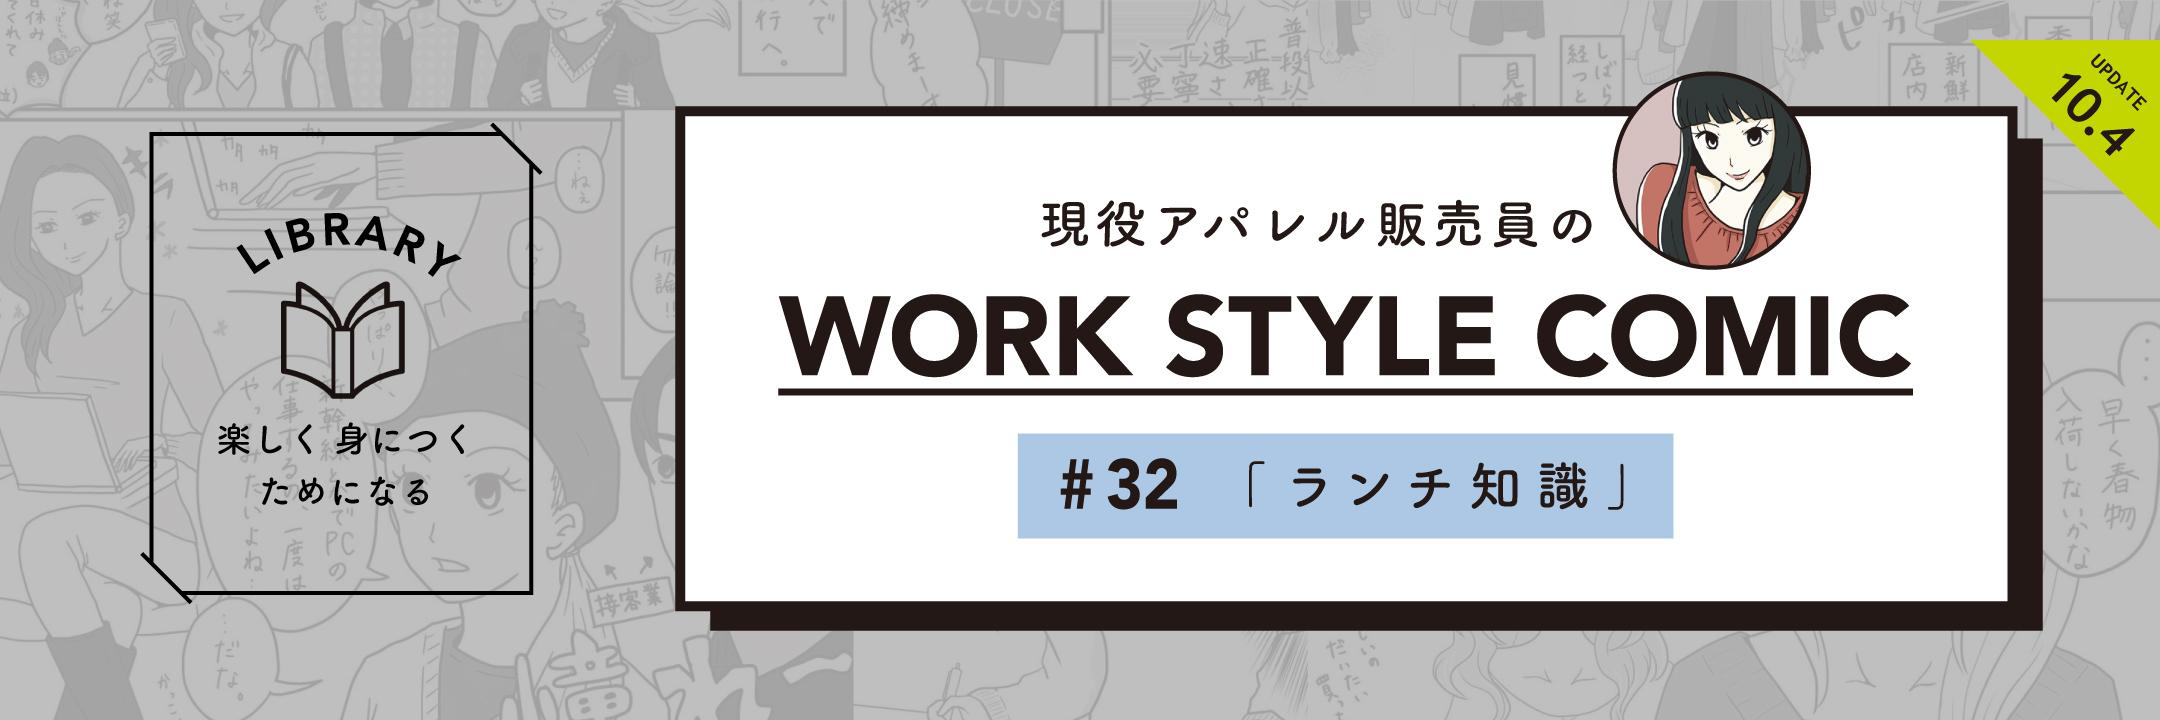 WORK STYLE COMIC32